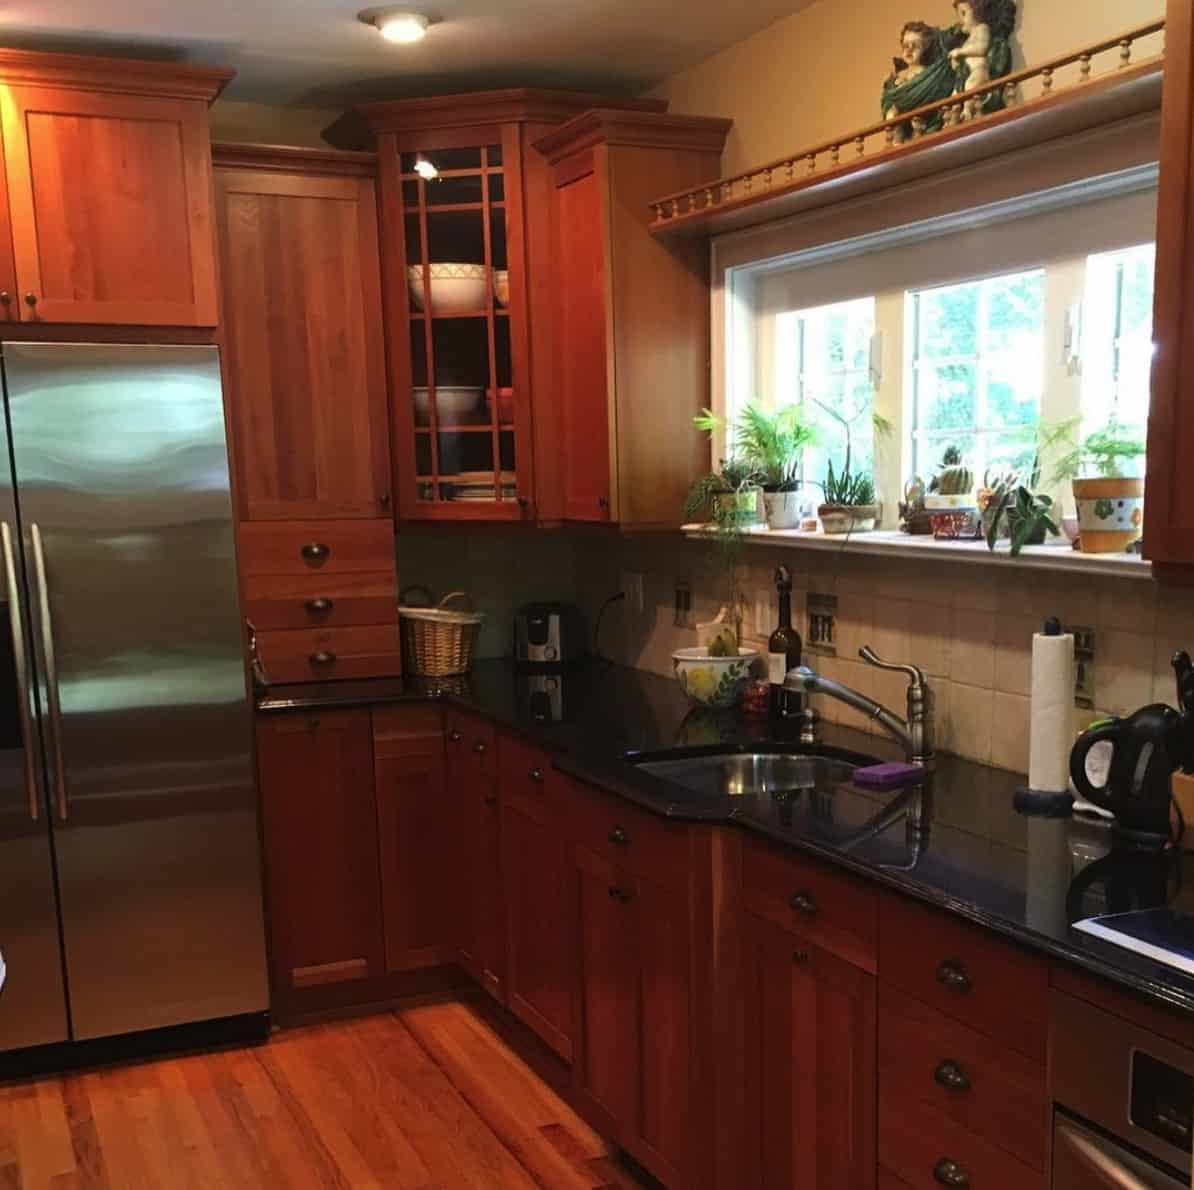 Tudor-revival-kitchen-before-the-renovation